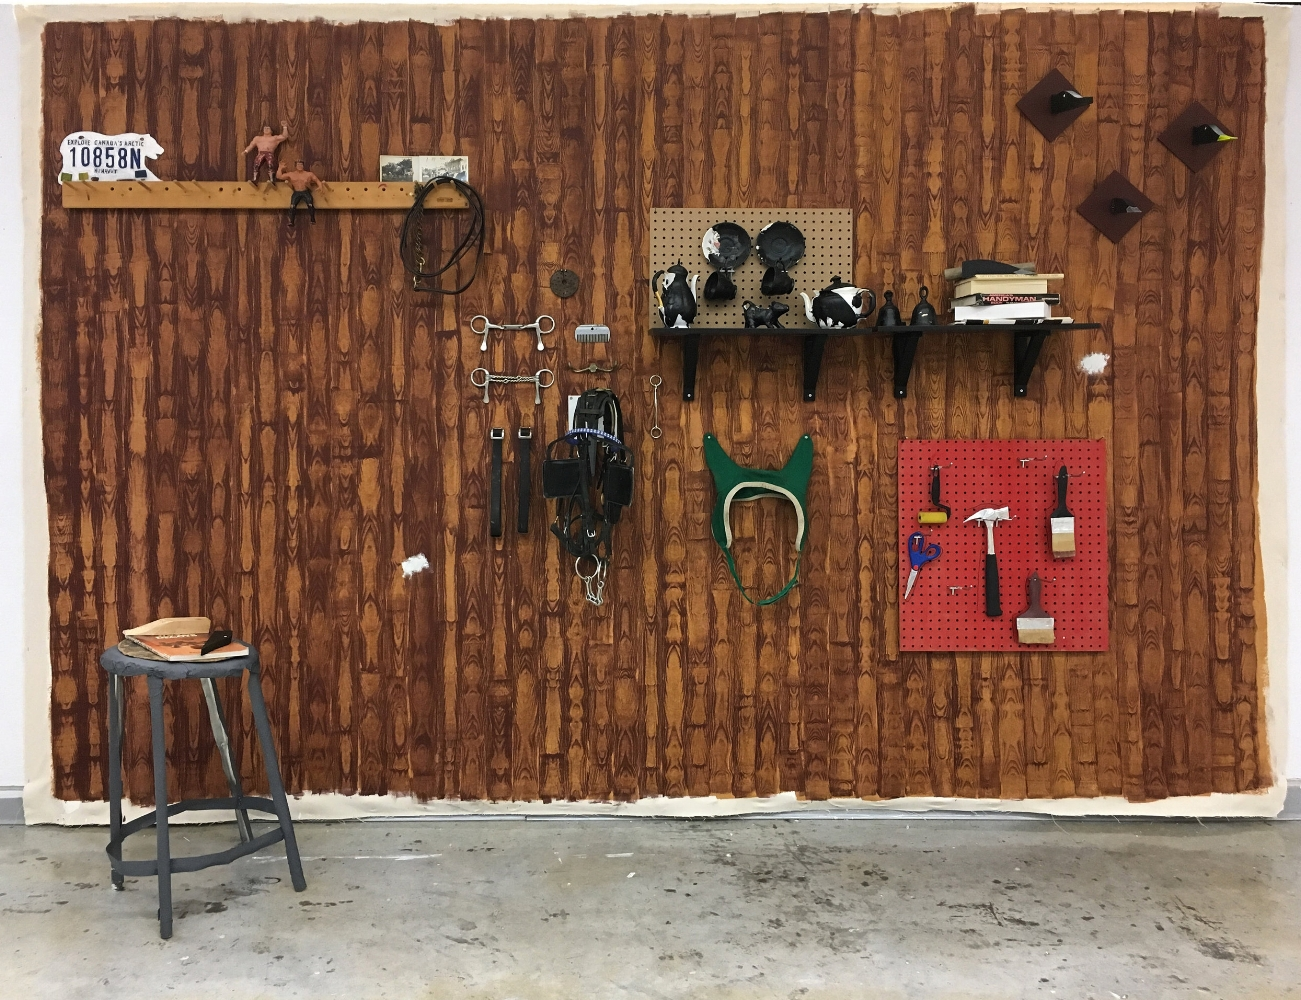 Man-Cave 2,  2017. Acrylic on canvas, wood, aluminum, wrestling figurines, horse tack, vintage tea set, found books and magazines, shelving, coat rack, hardware. Painted backdrop measures approximately 8' x 15'